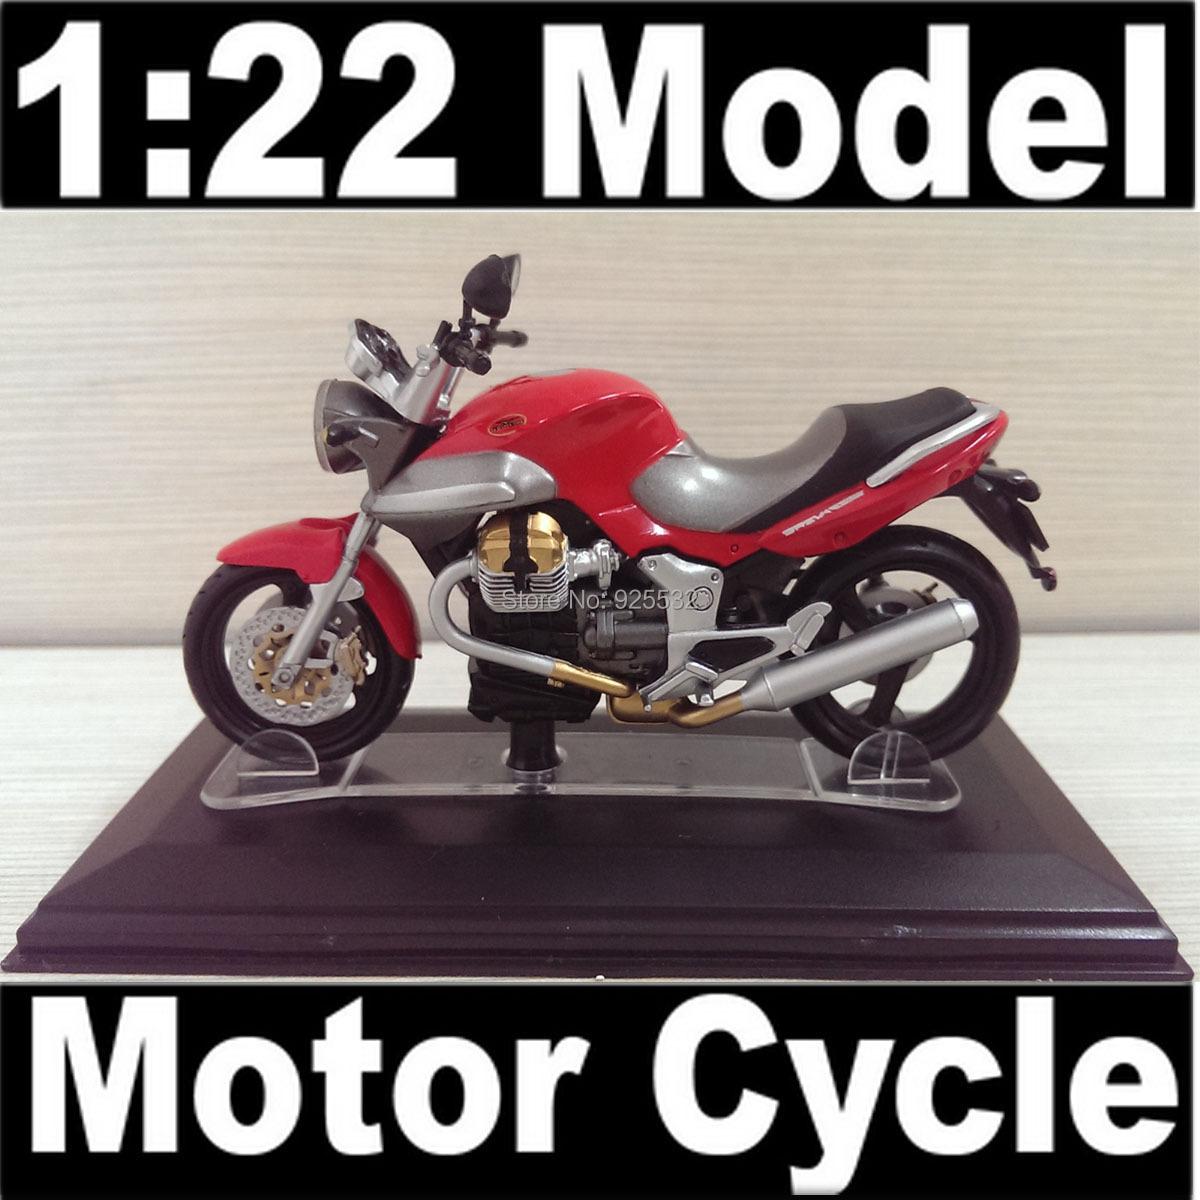 NEW Motor GUZZI (Breva v1100) Diecast Model 1:22 Motor Cycle model with Plastic Transparent box show Toy model FREE SHIPPING(China (Mainland))